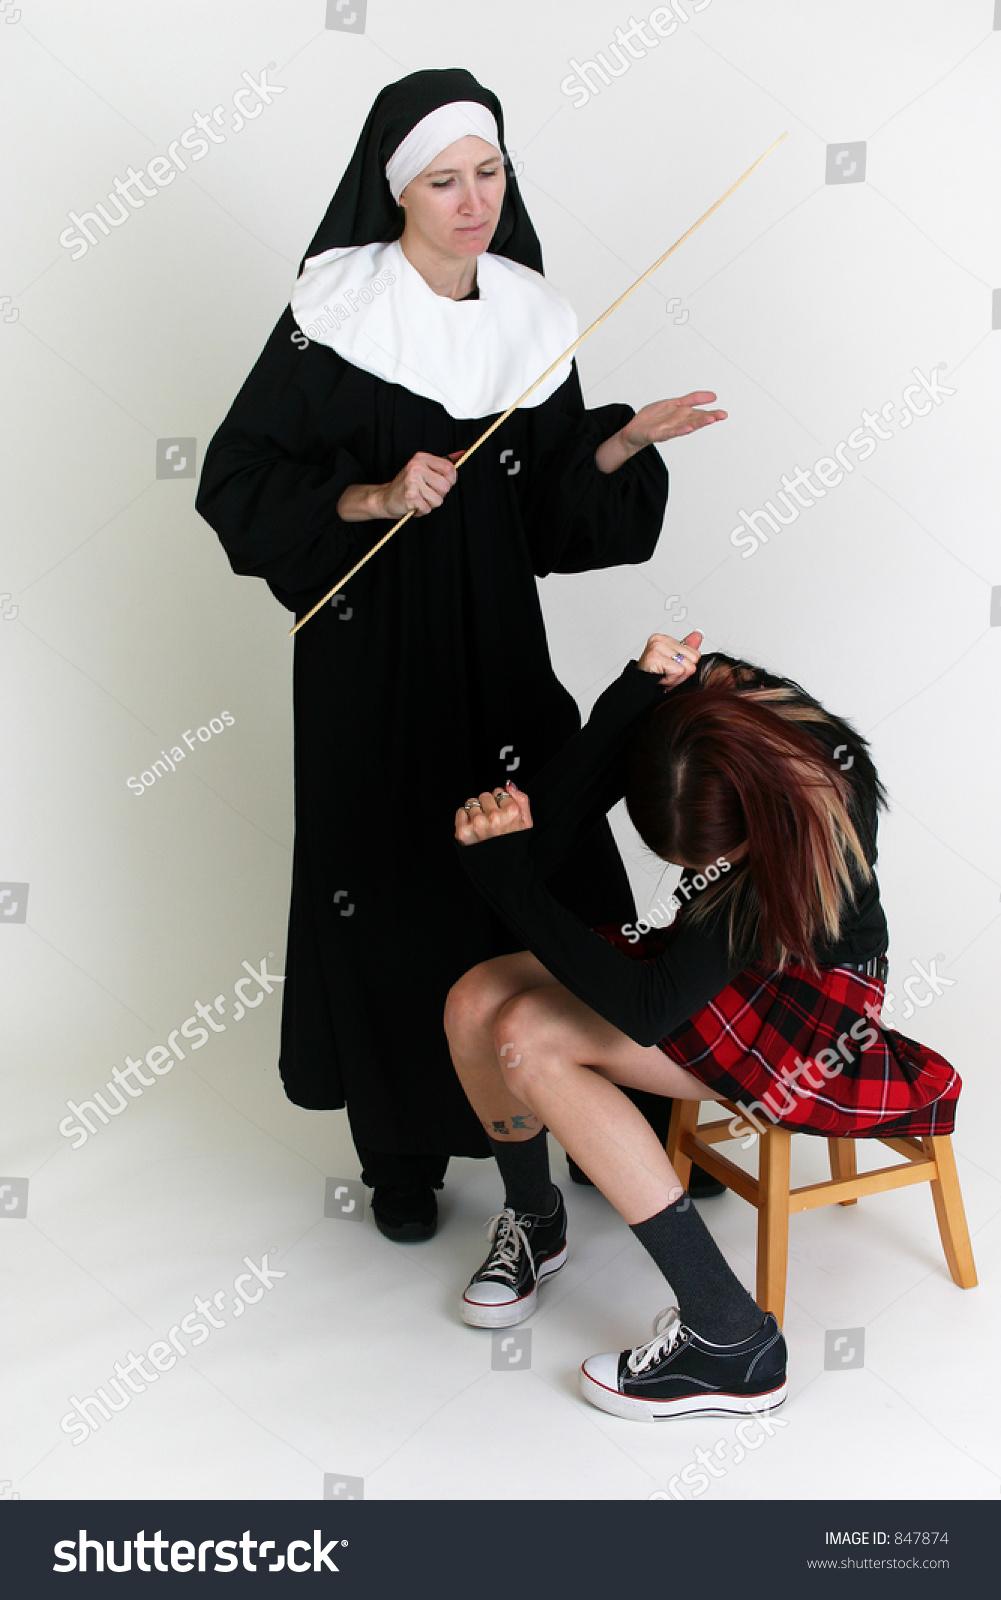 nun diciplining school girl stock photo (safe to use) 847874